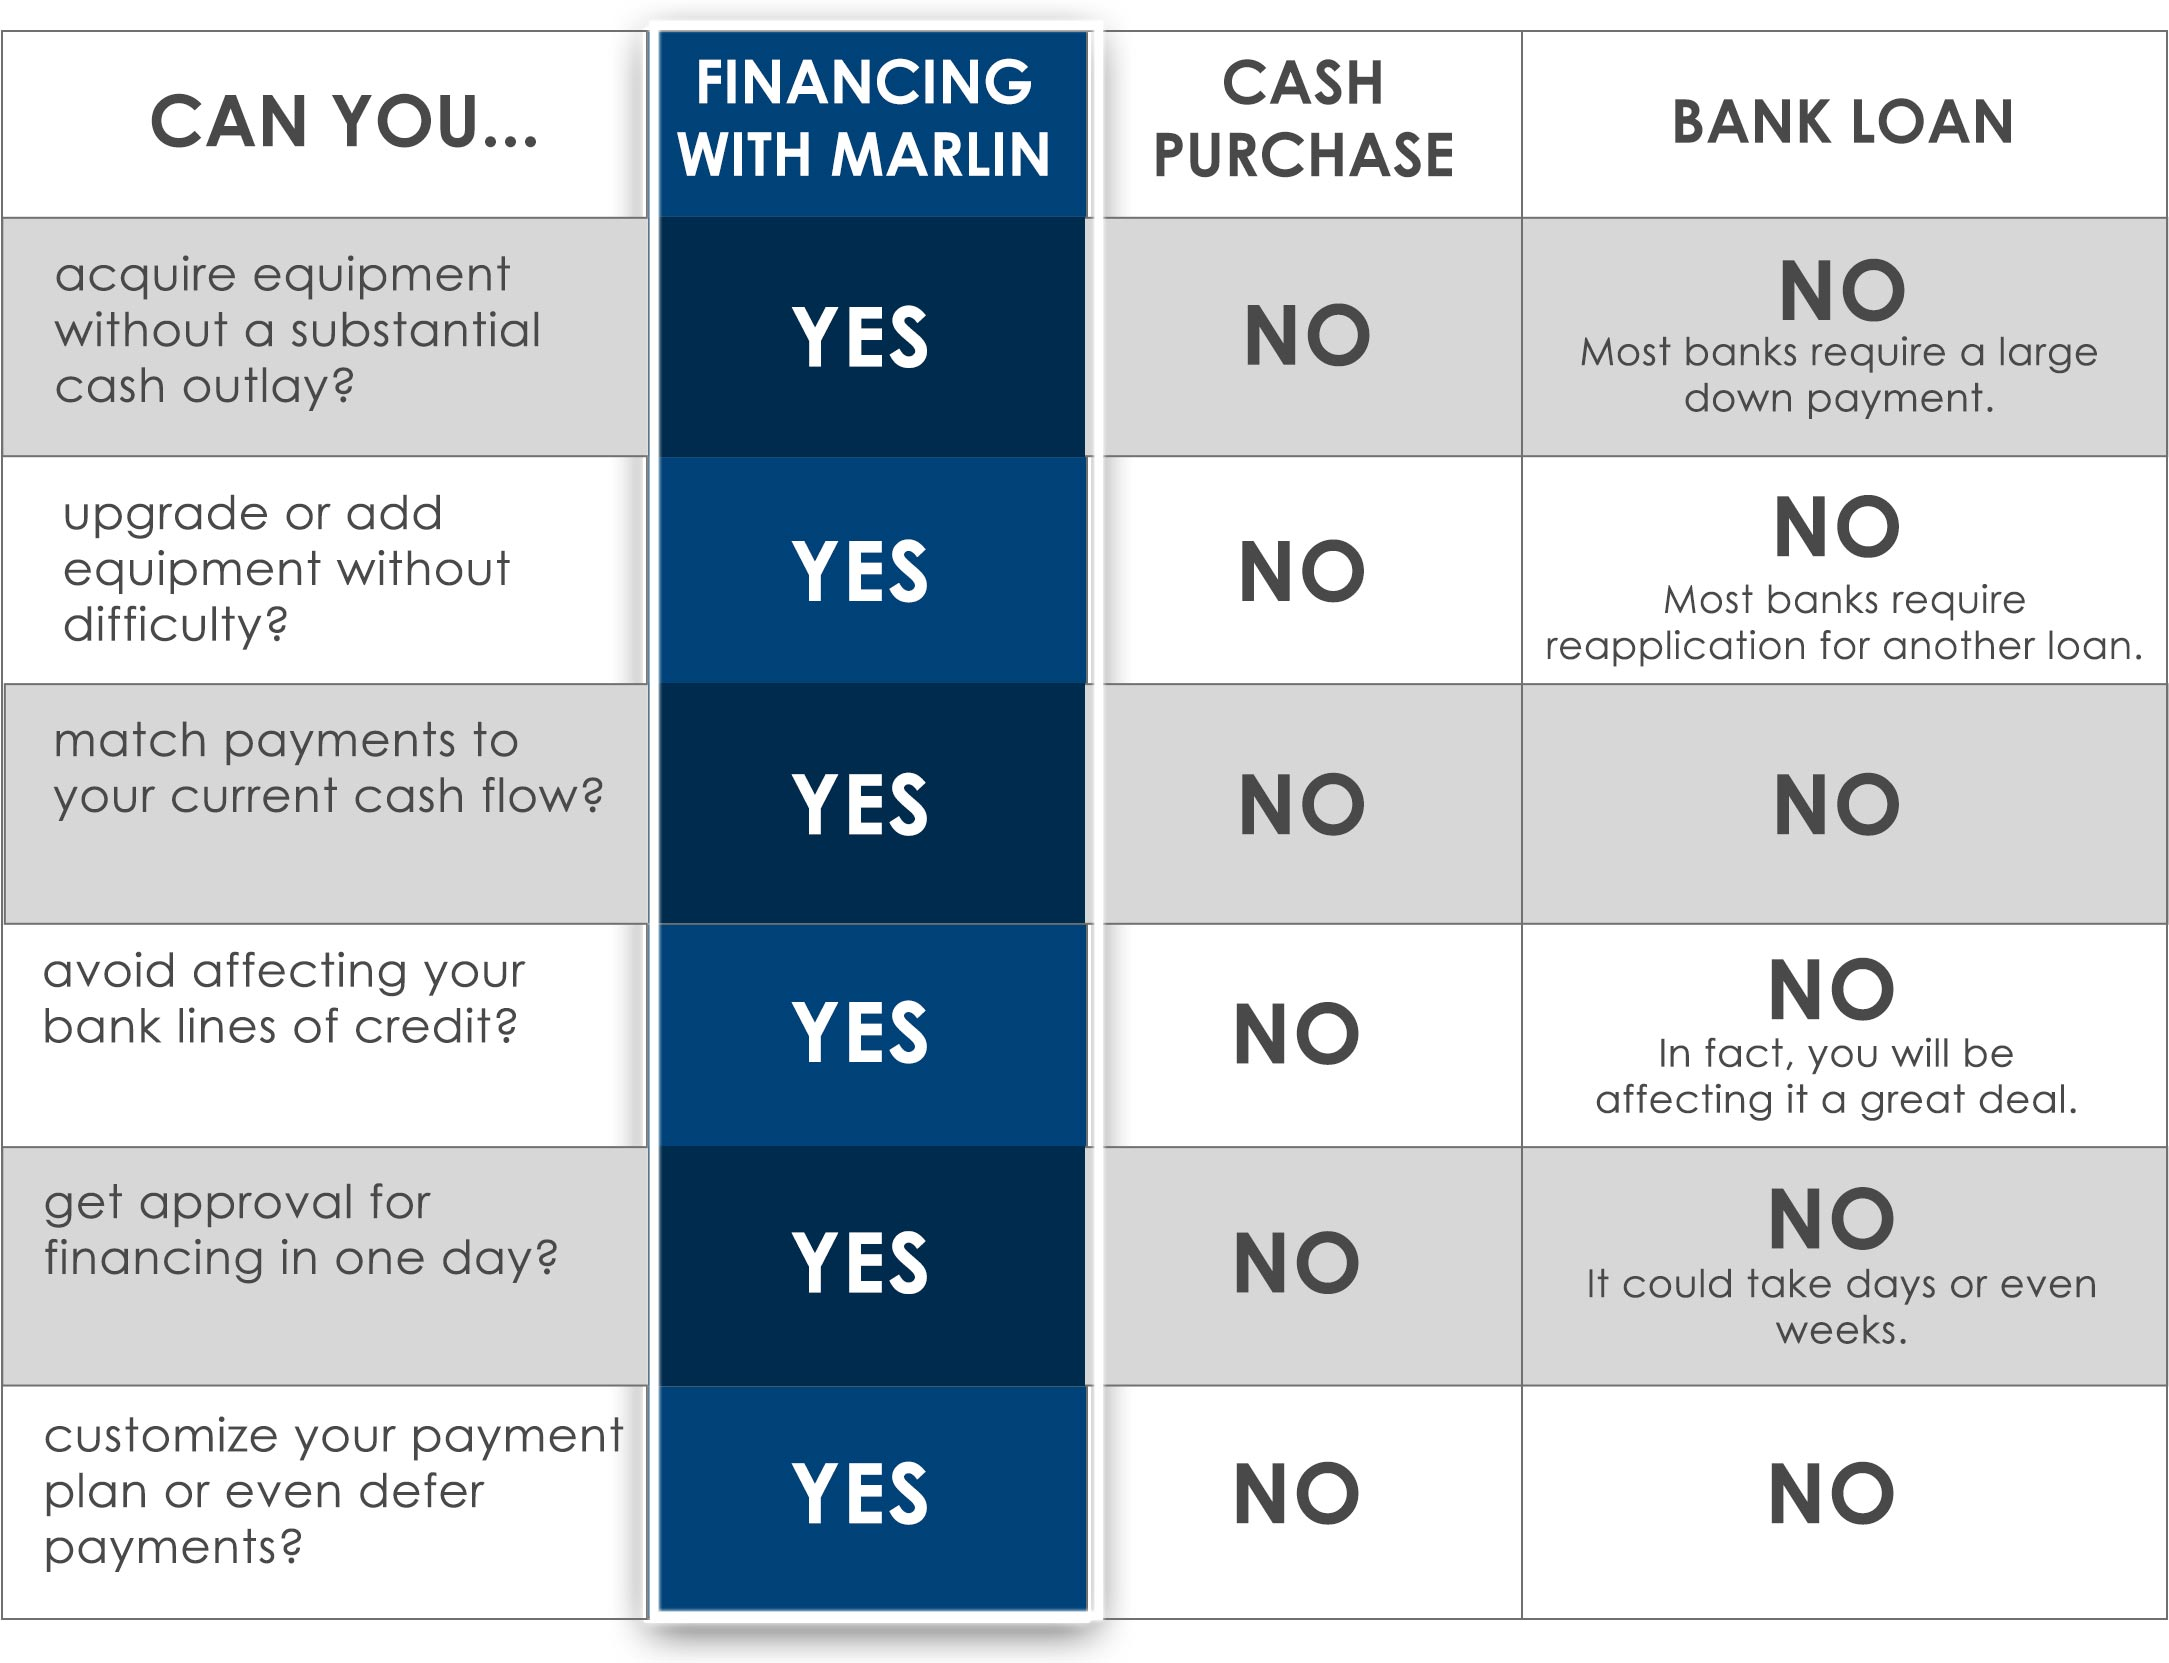 Logic of Marlin Financing